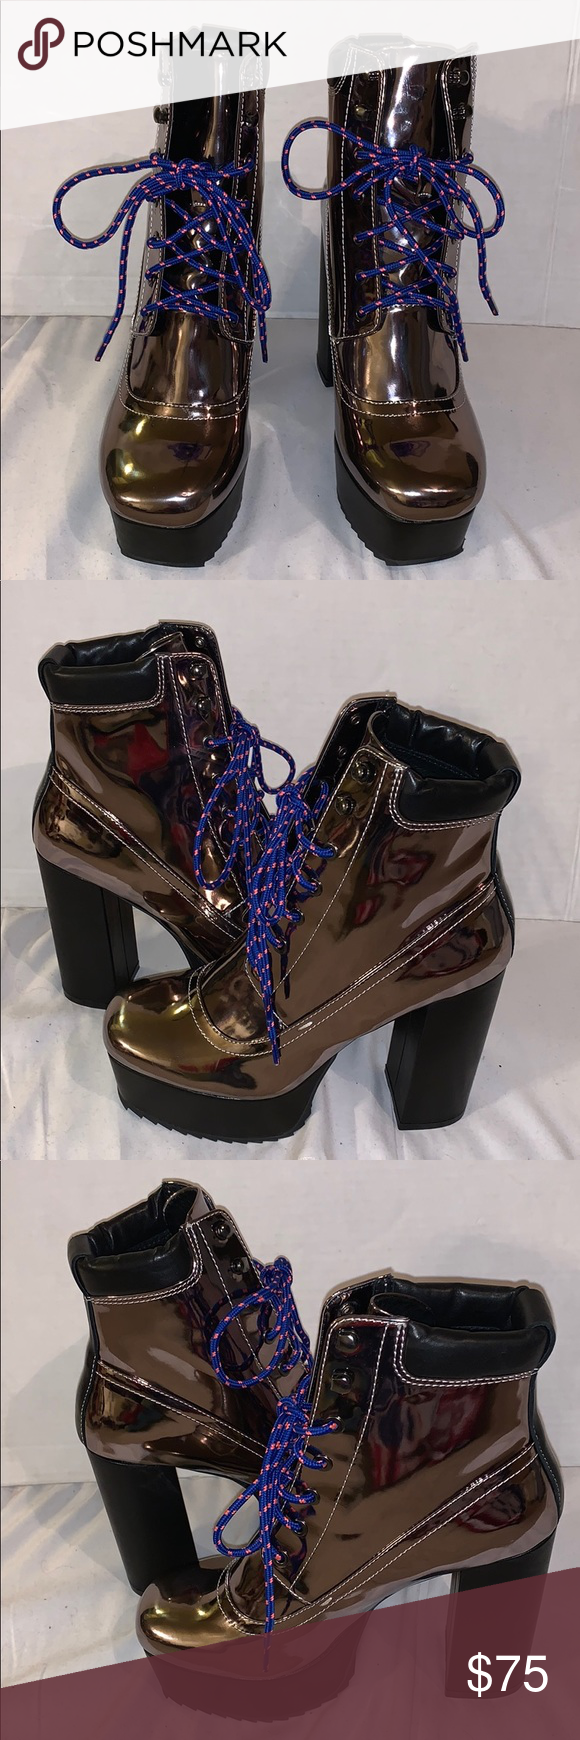 Shellys London Evan Black Floral Multi Lace Up Chunky Platform Chunky Heel Boot